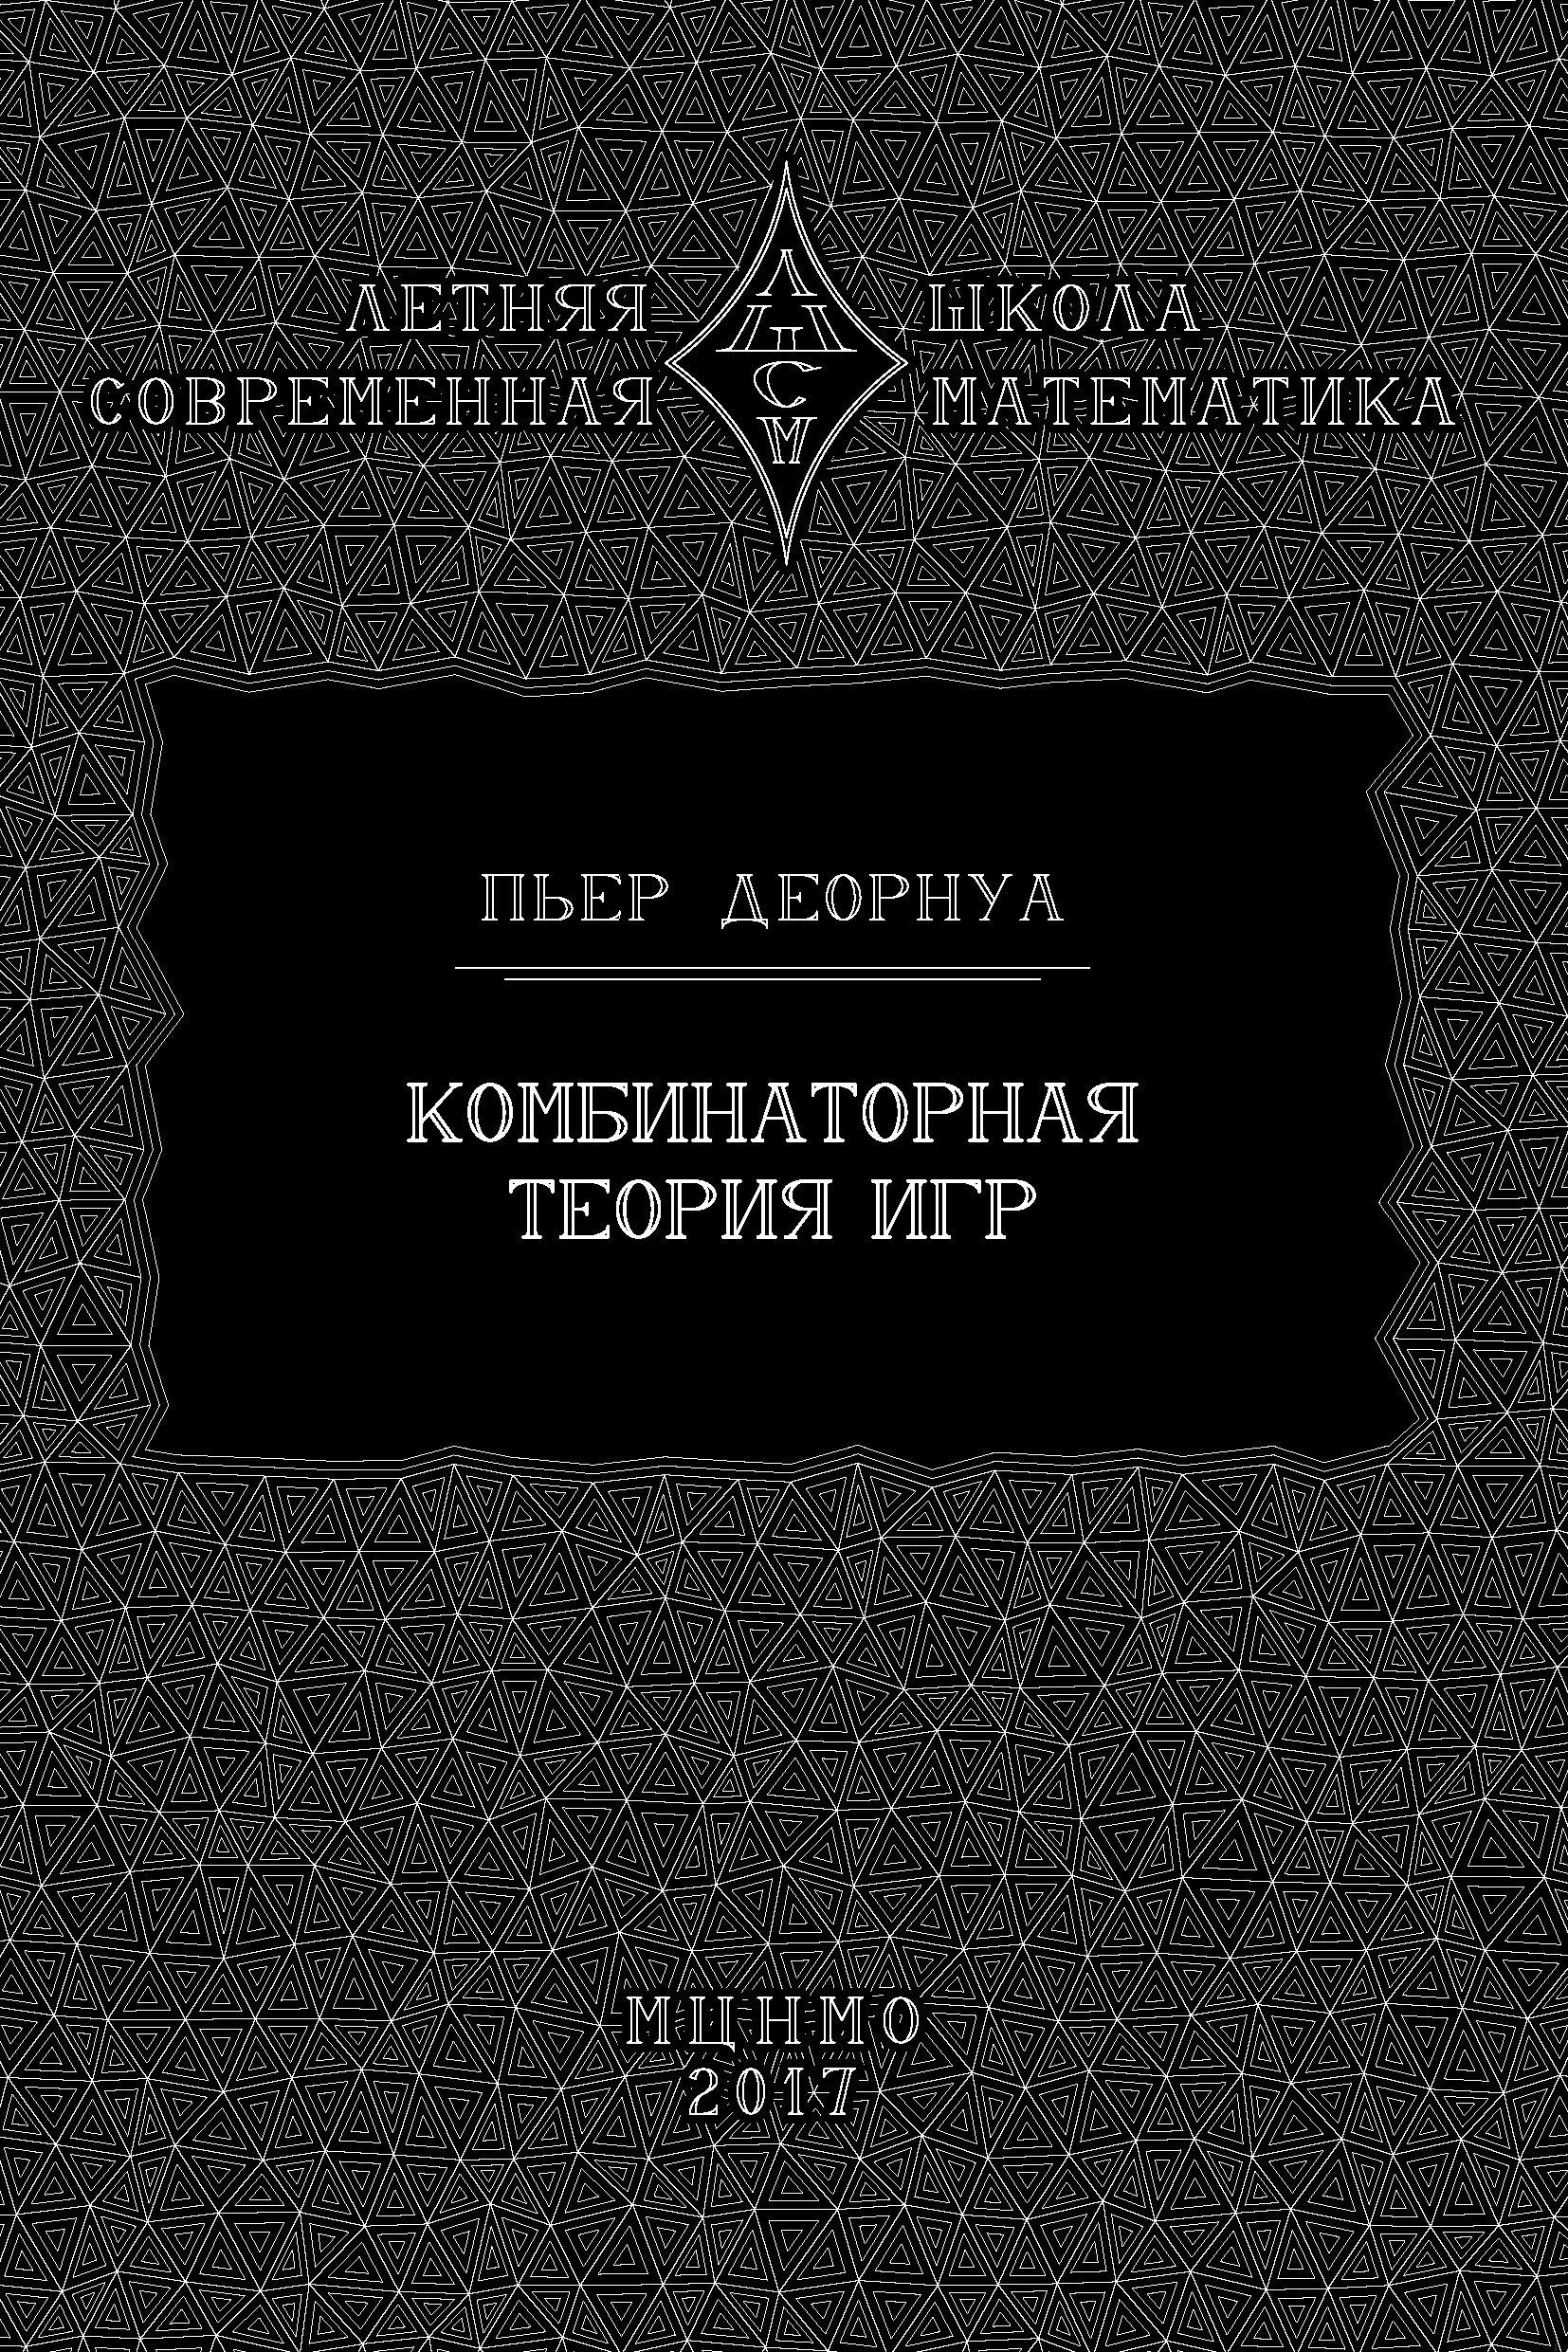 Пьер Деорнуа Комбинаторная теория игр айгнер м комбинаторная теория